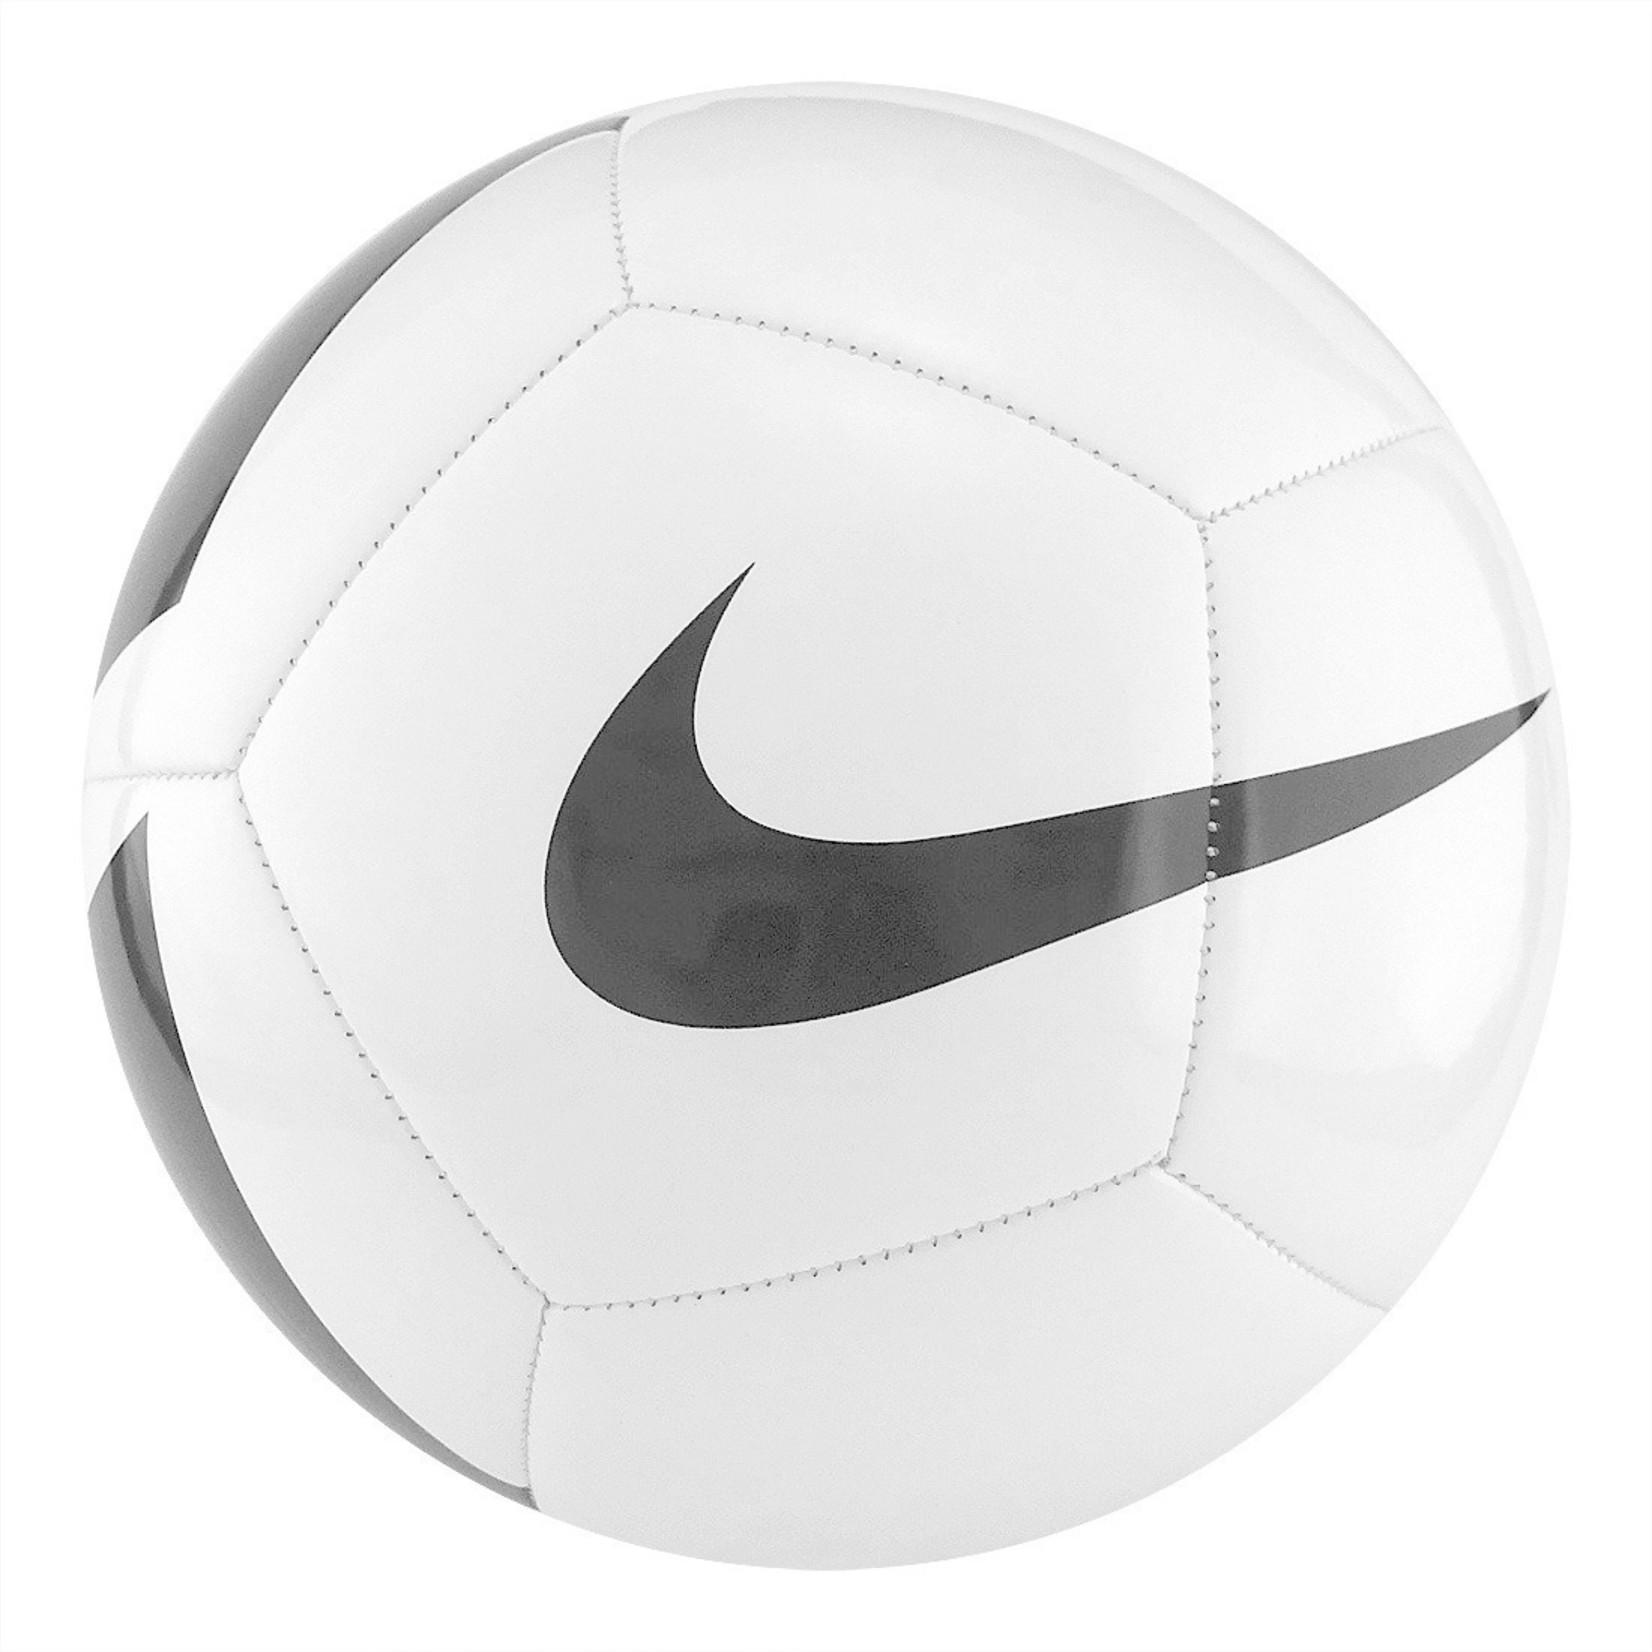 Nike Nike Soccer Ball, Pitch Team